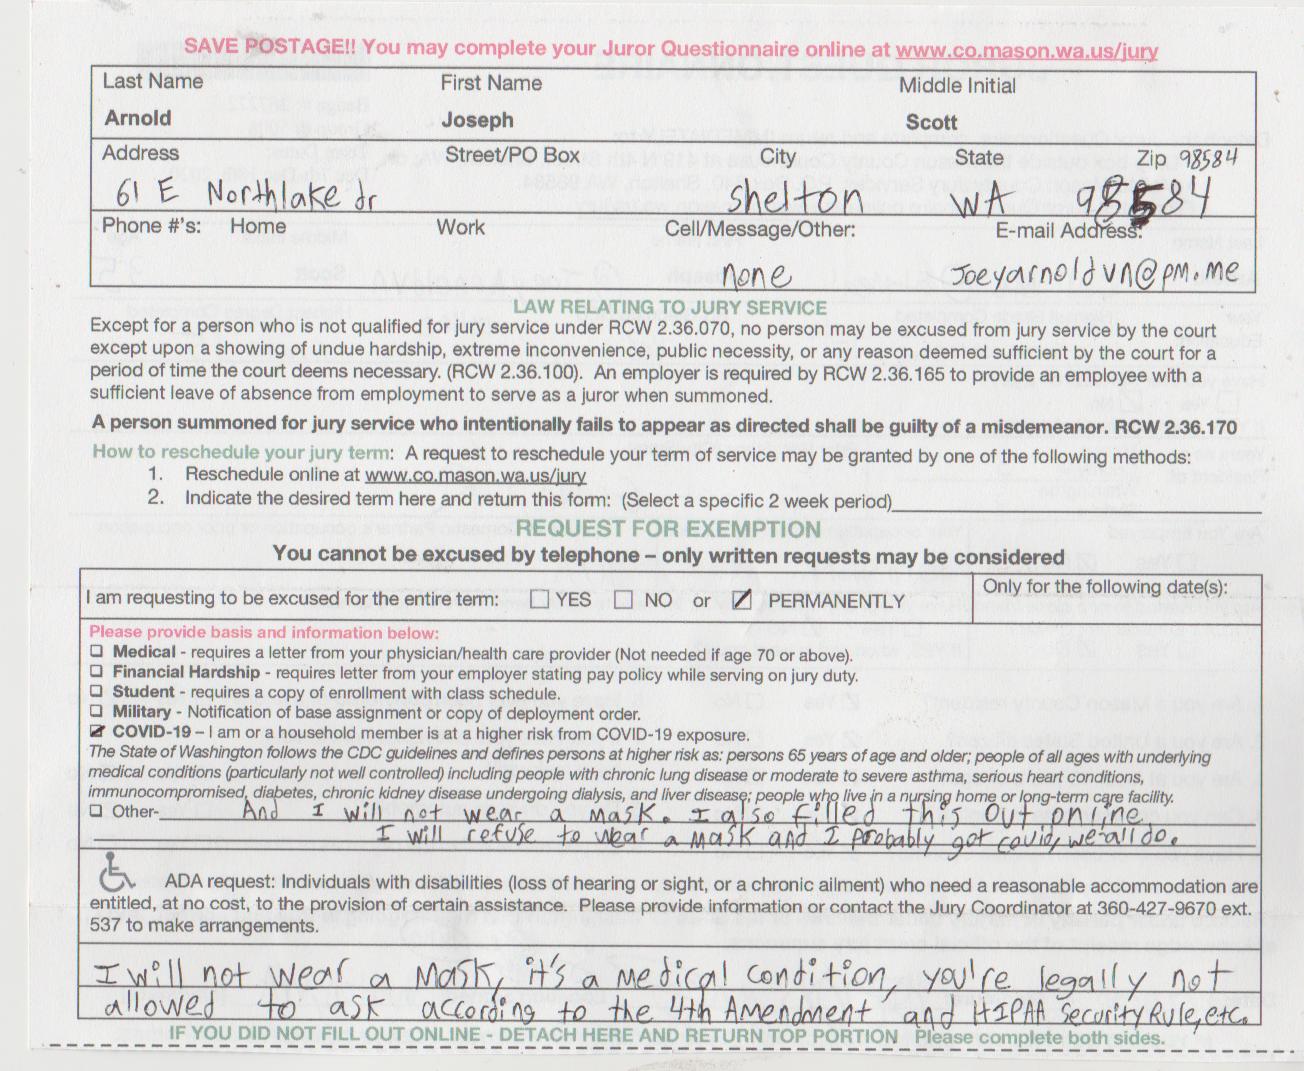 2020-11-07 - Saturday - 03:00 PM LMS JA - Jury Duty Request - Shelton WA - Form & Survey Pages Update-2.png